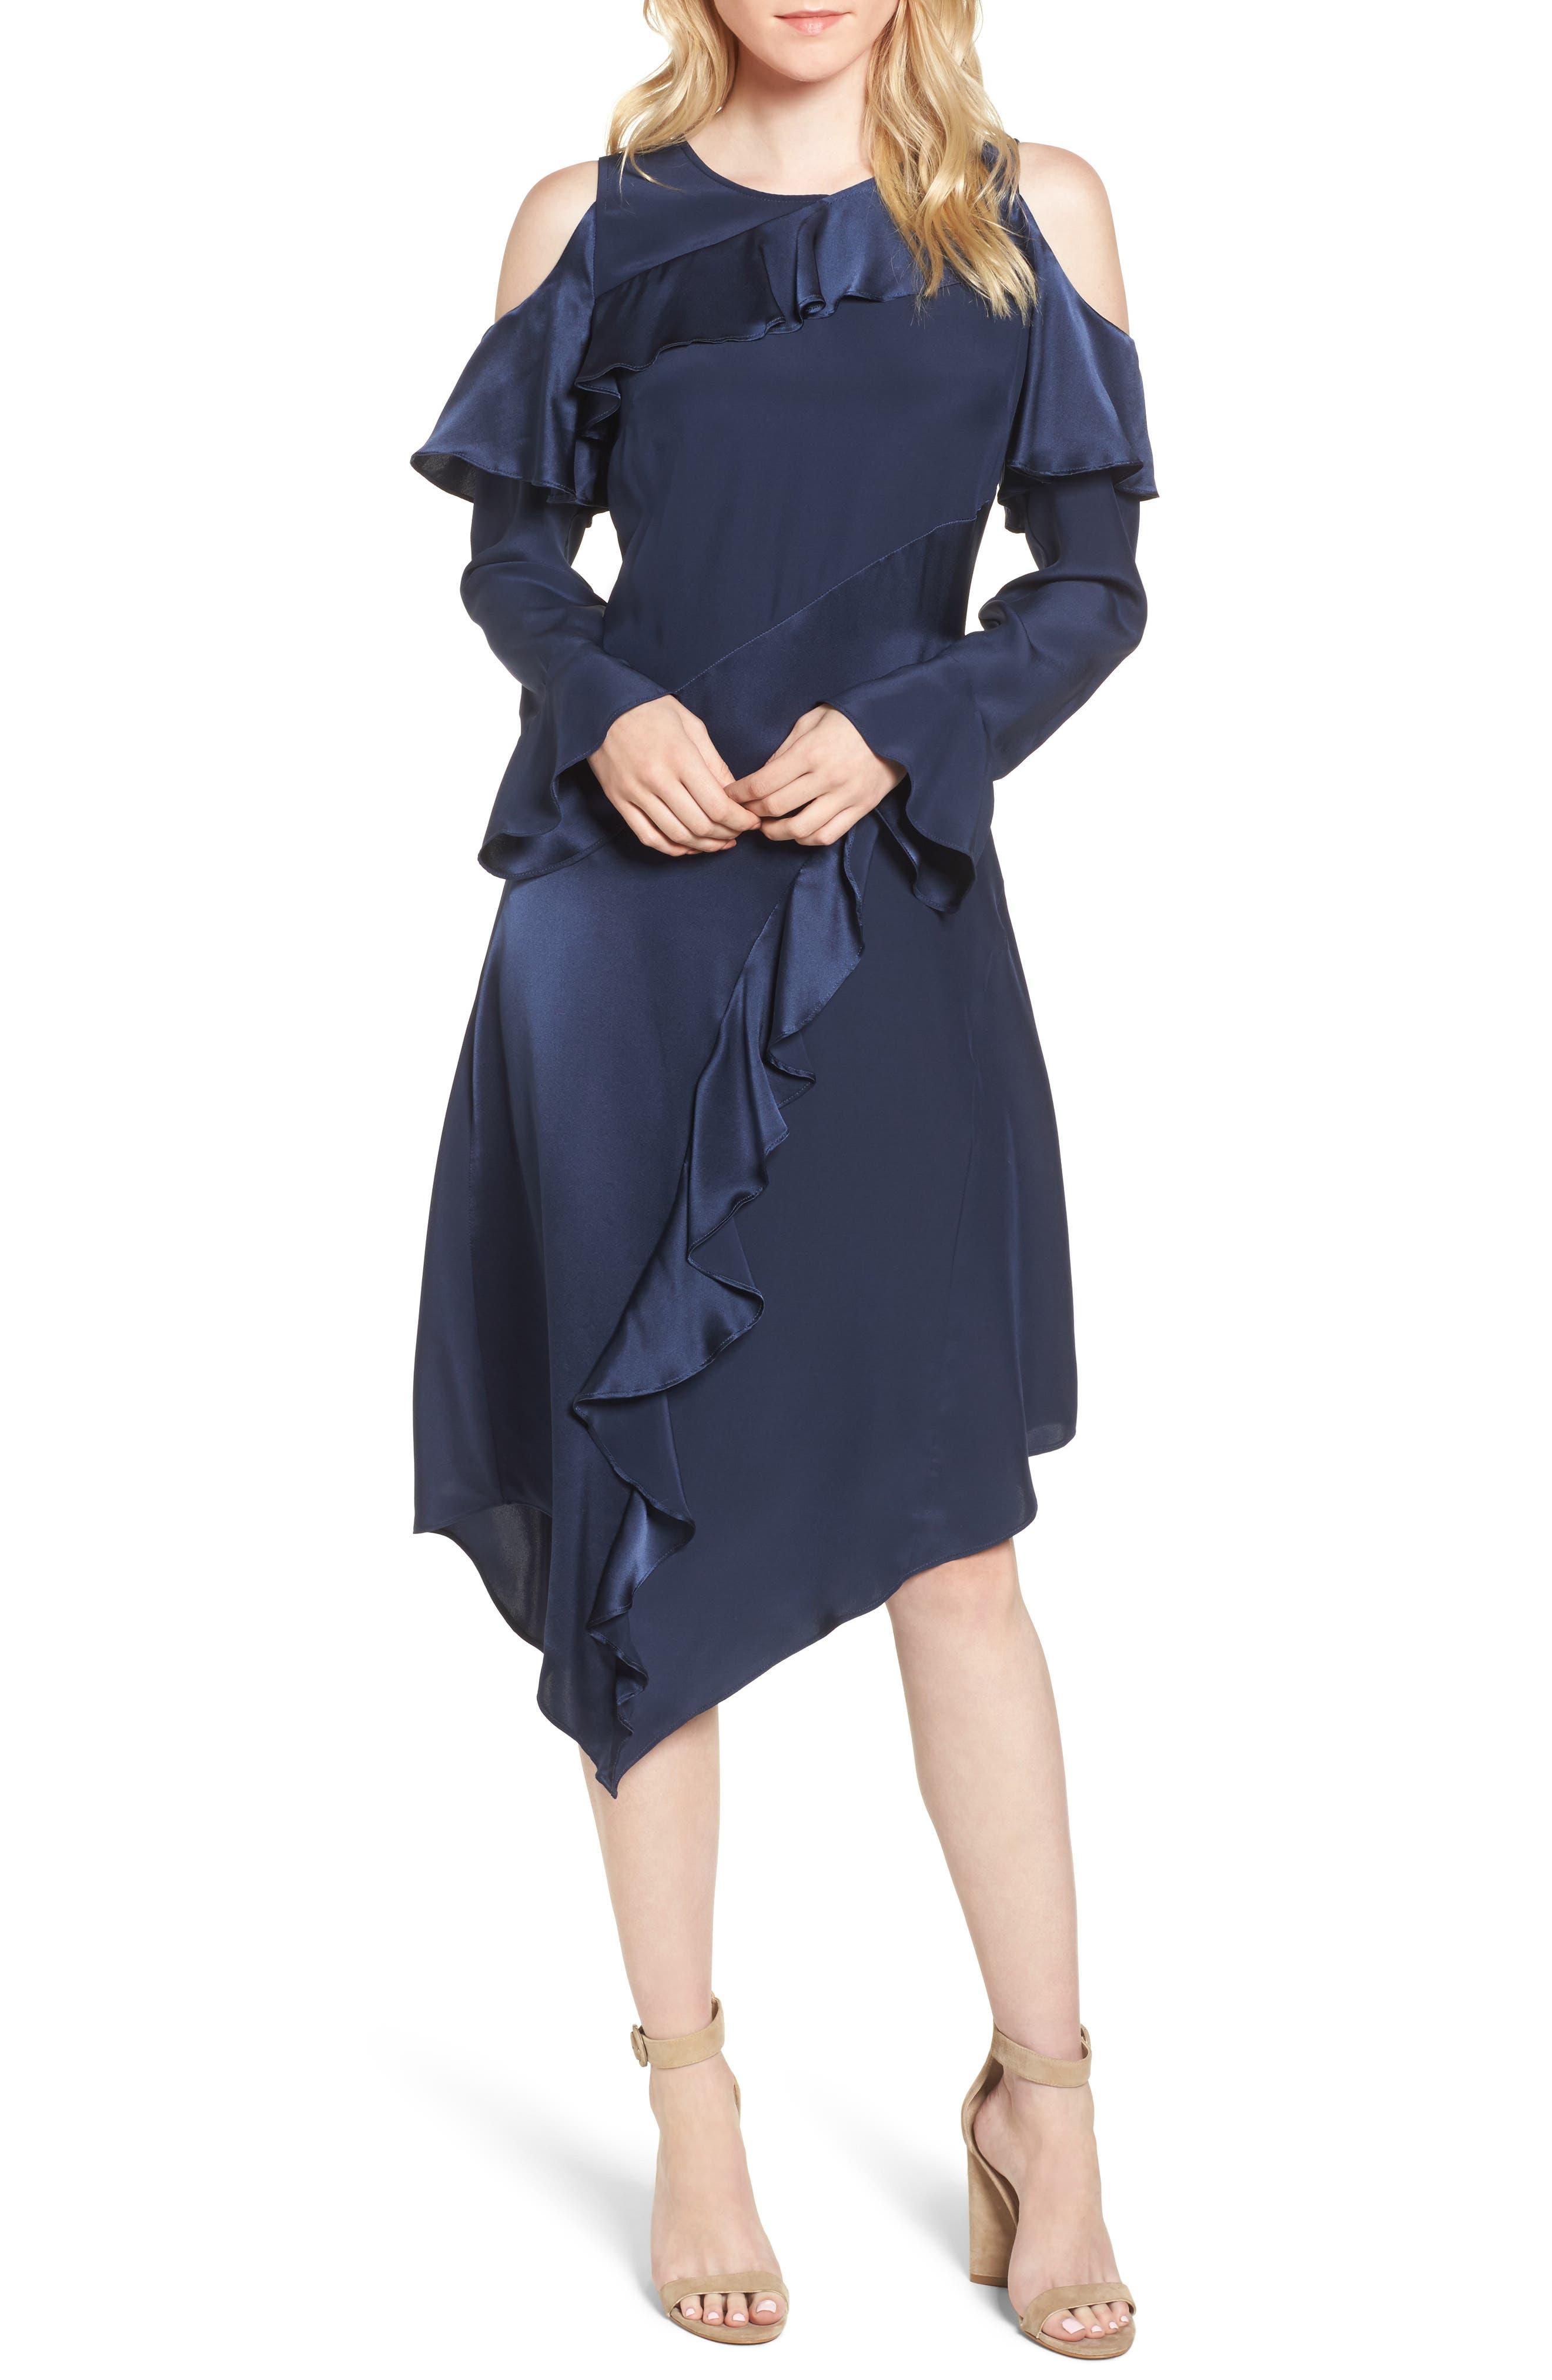 Nadeen Ruffle Cold Shoulder A-Line Dress,                             Main thumbnail 1, color,                             004